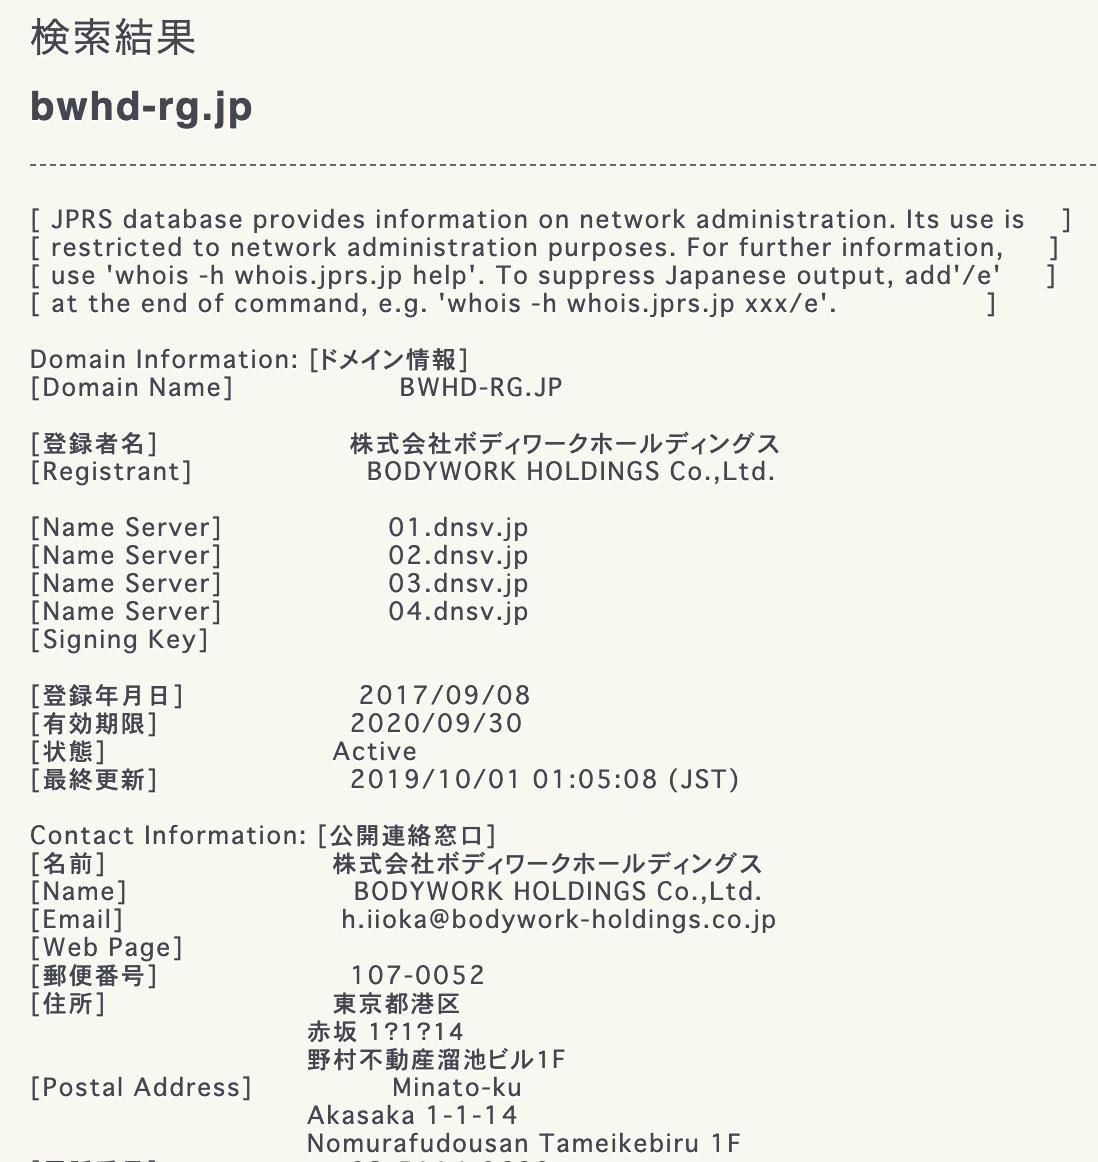 f:id:binbocchama:20200513145649p:plain